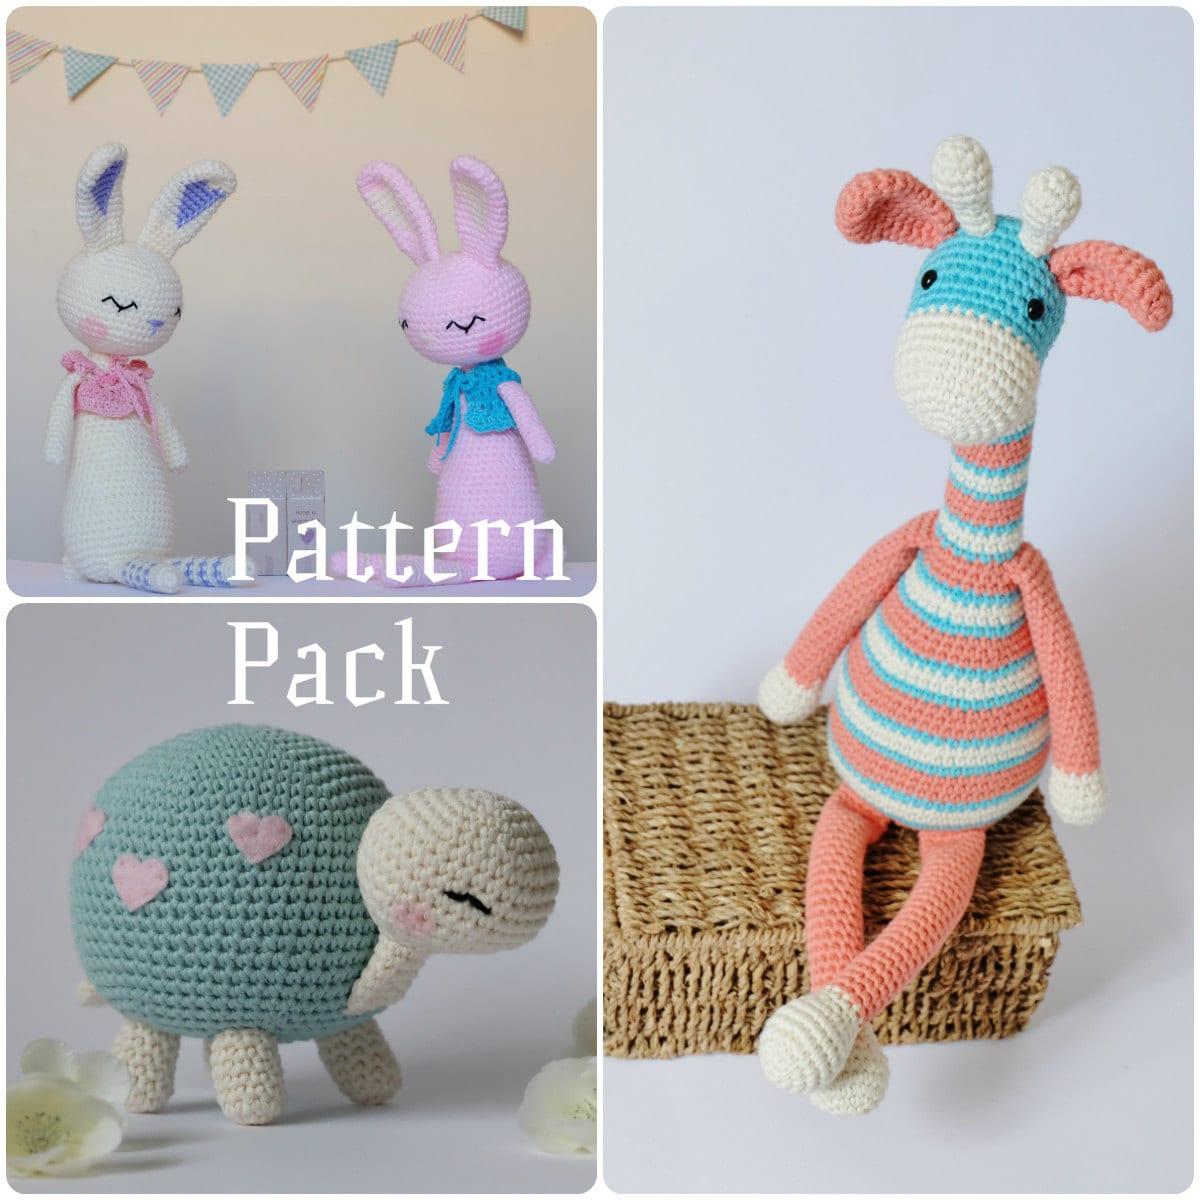 Amigurumi Toys Pattern : Crochet Amigurumi Toy PATTERN Pack Special Offer Giraffe